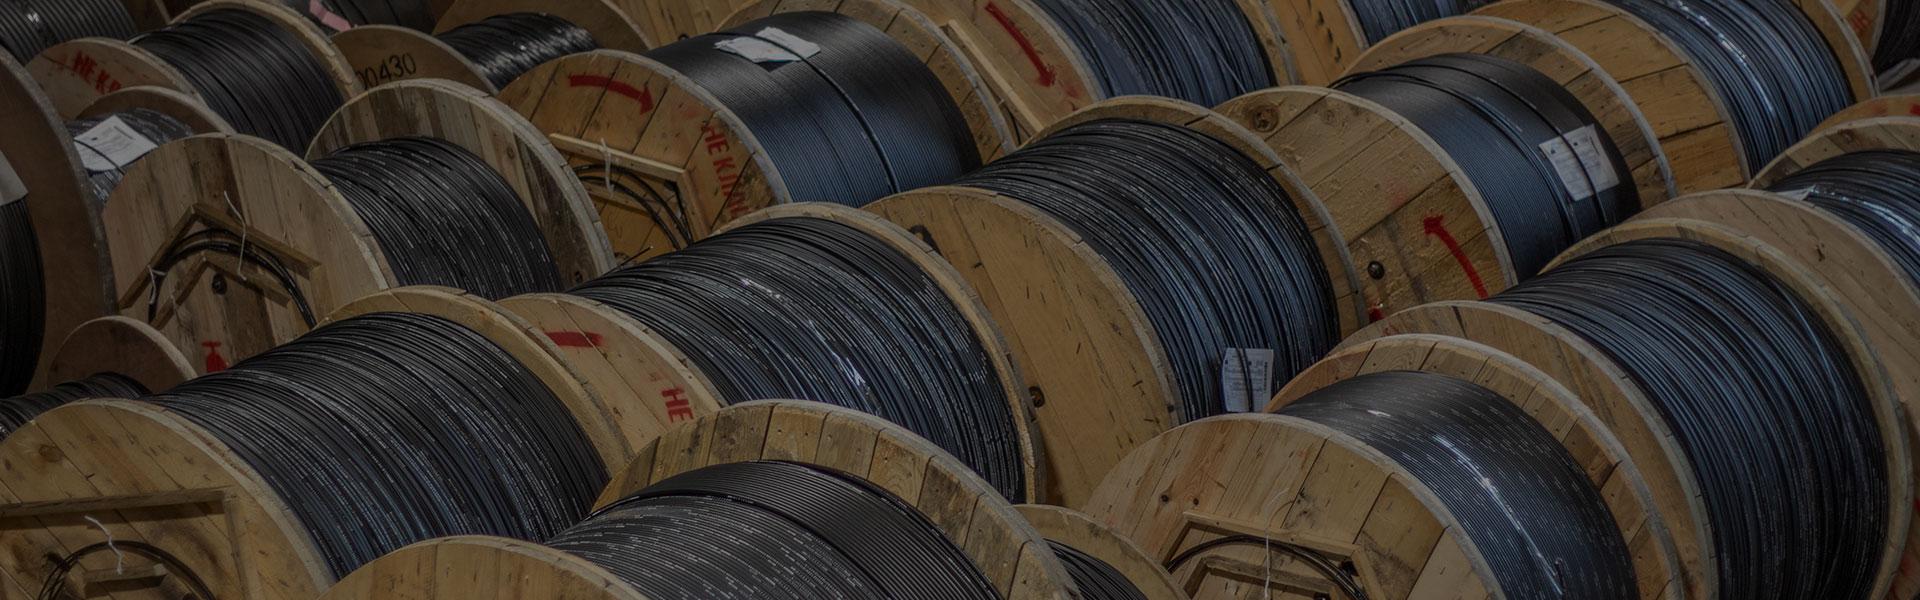 Integra Cable Storage